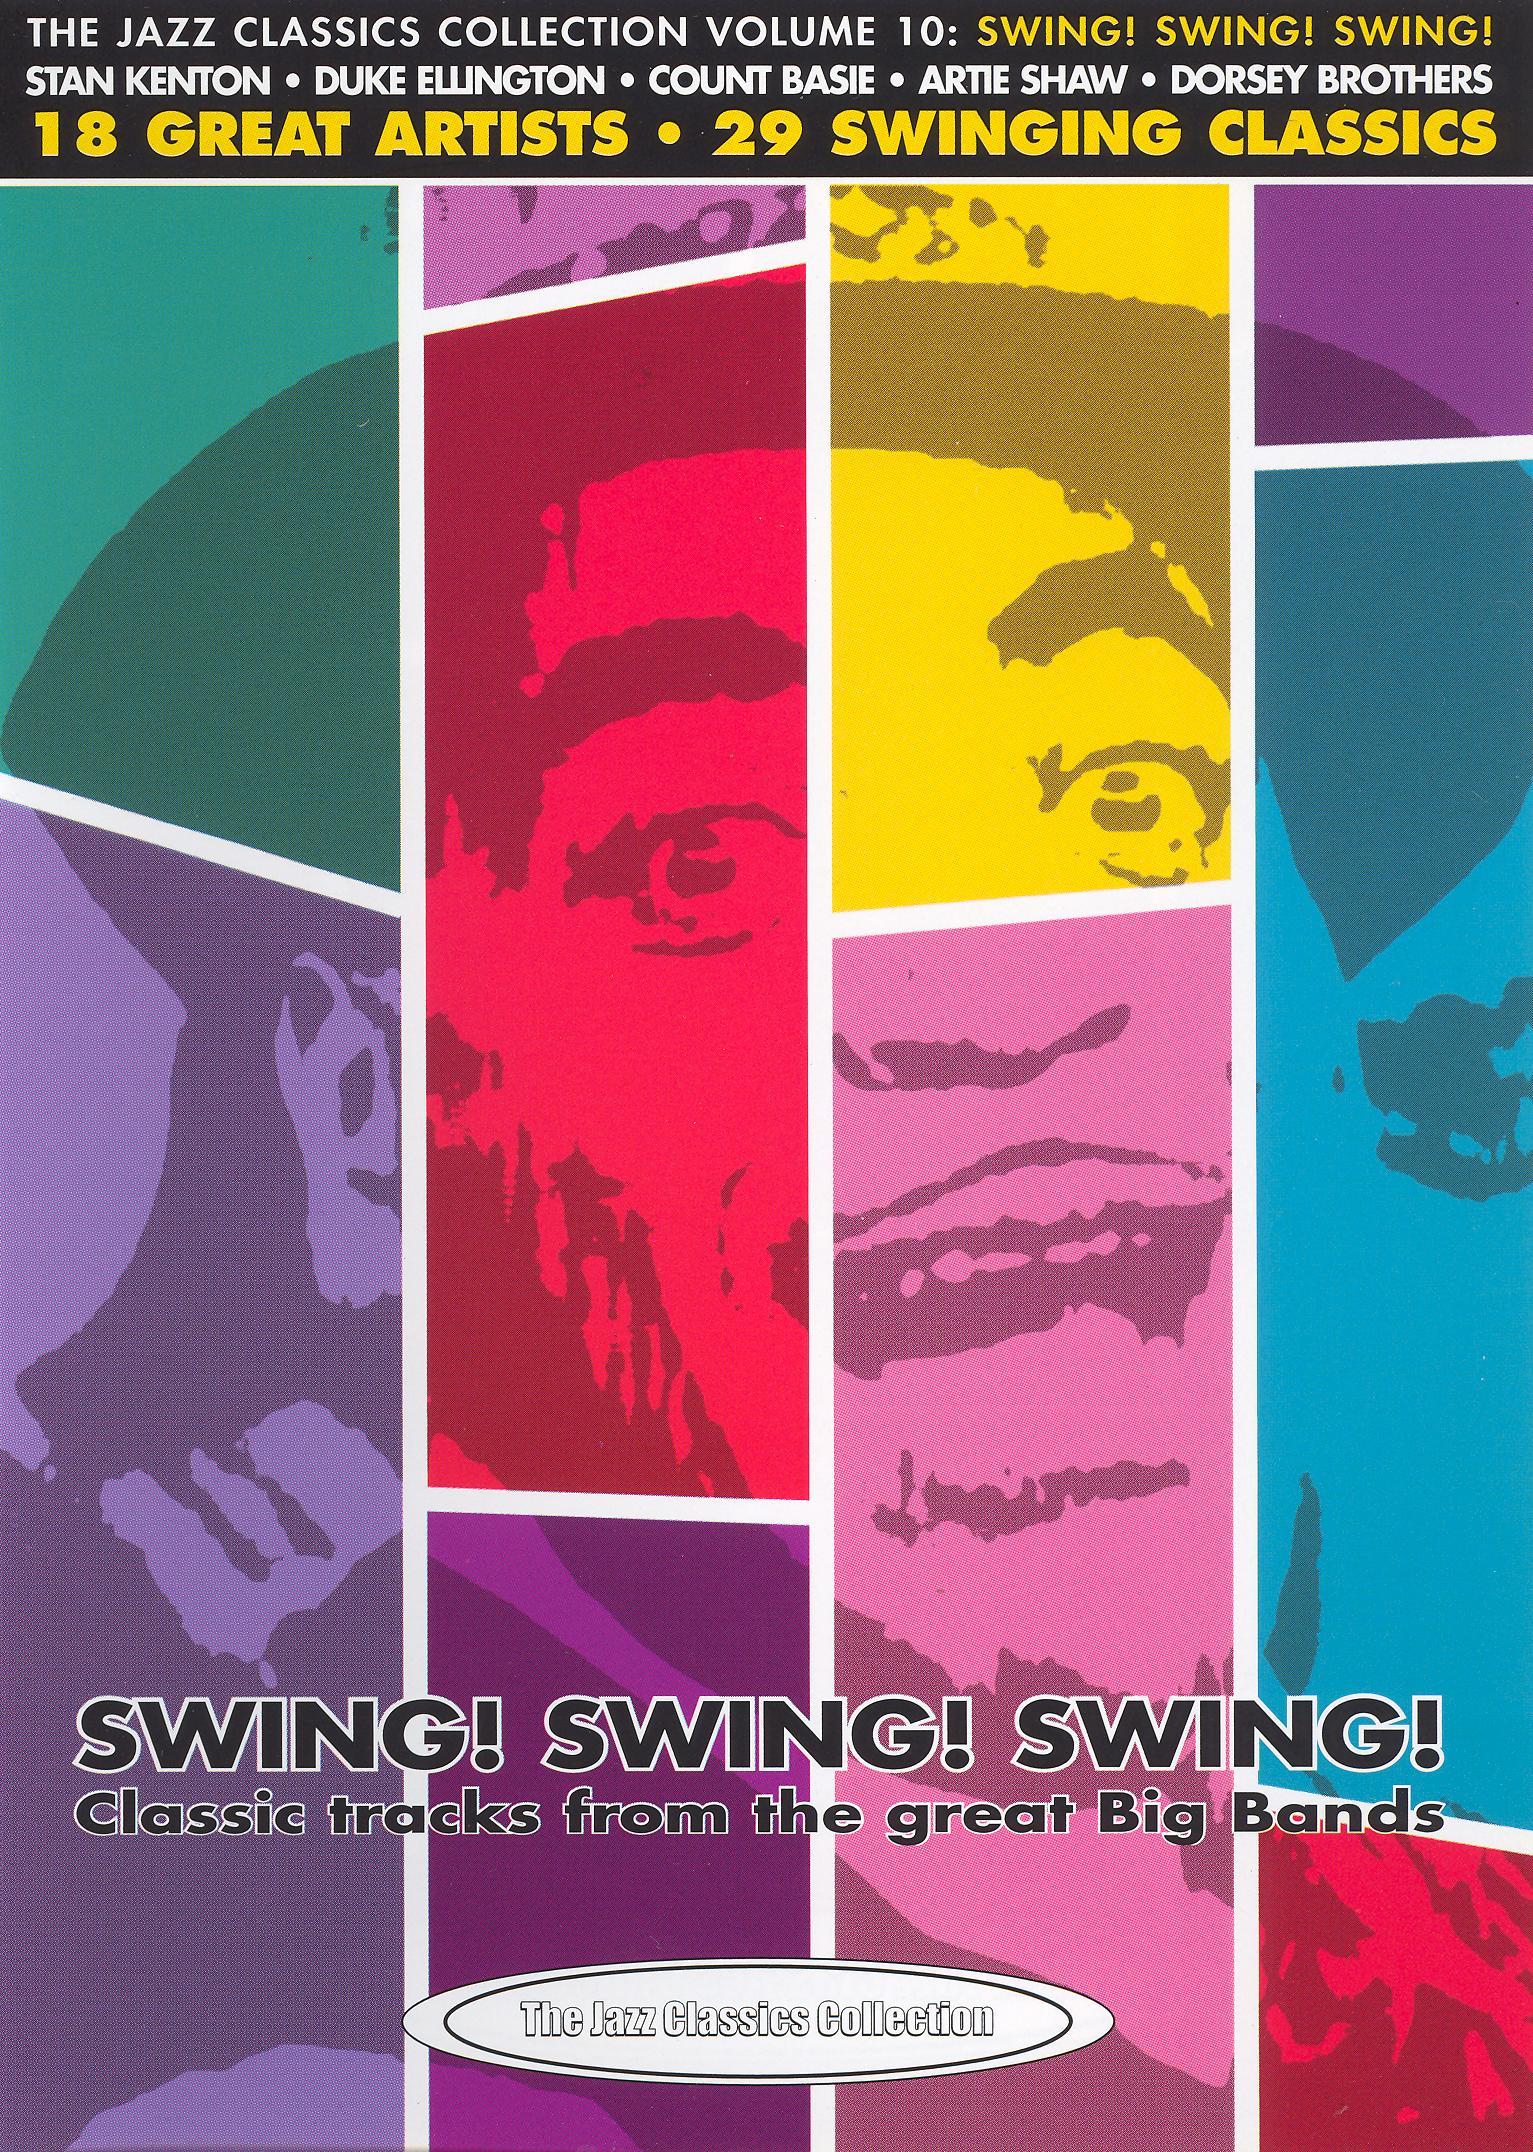 Jazz Classics Collection, Vol. 10: Swing! Swing! Swing!